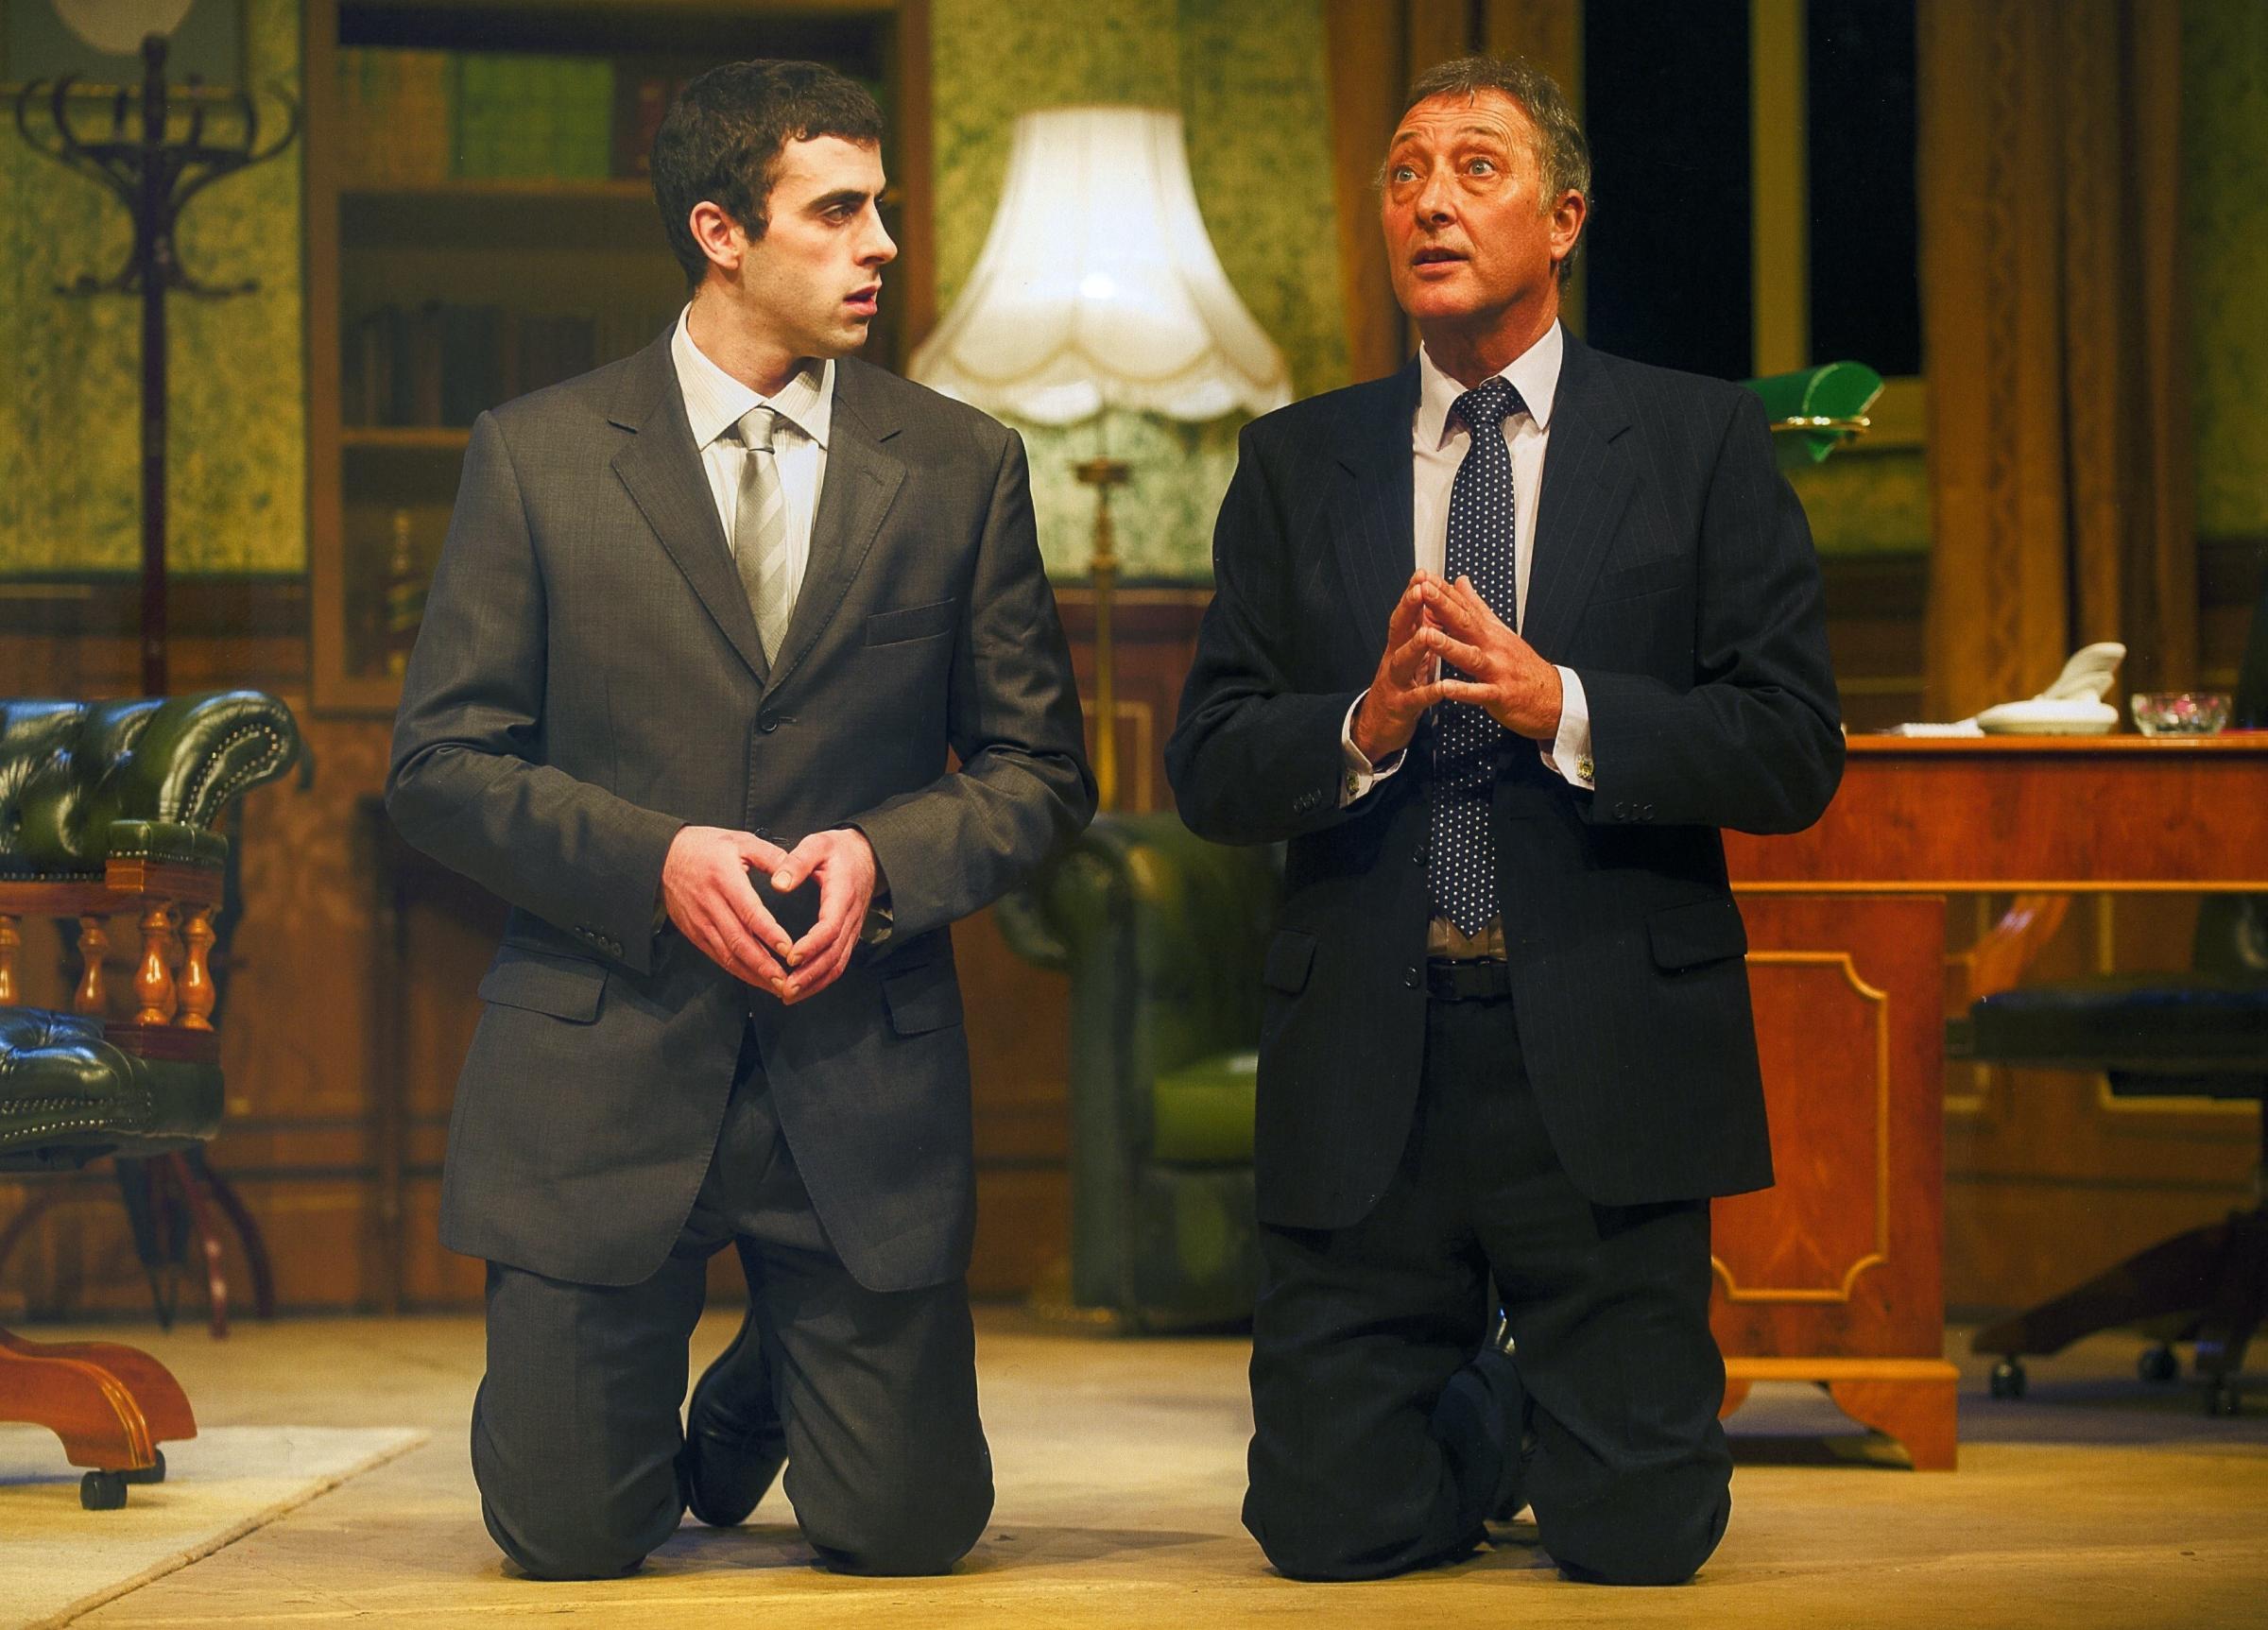 In need of divine help - Daniel Ferguson as Bernard Wooley and Malcolm Cooper as Jim Hacker